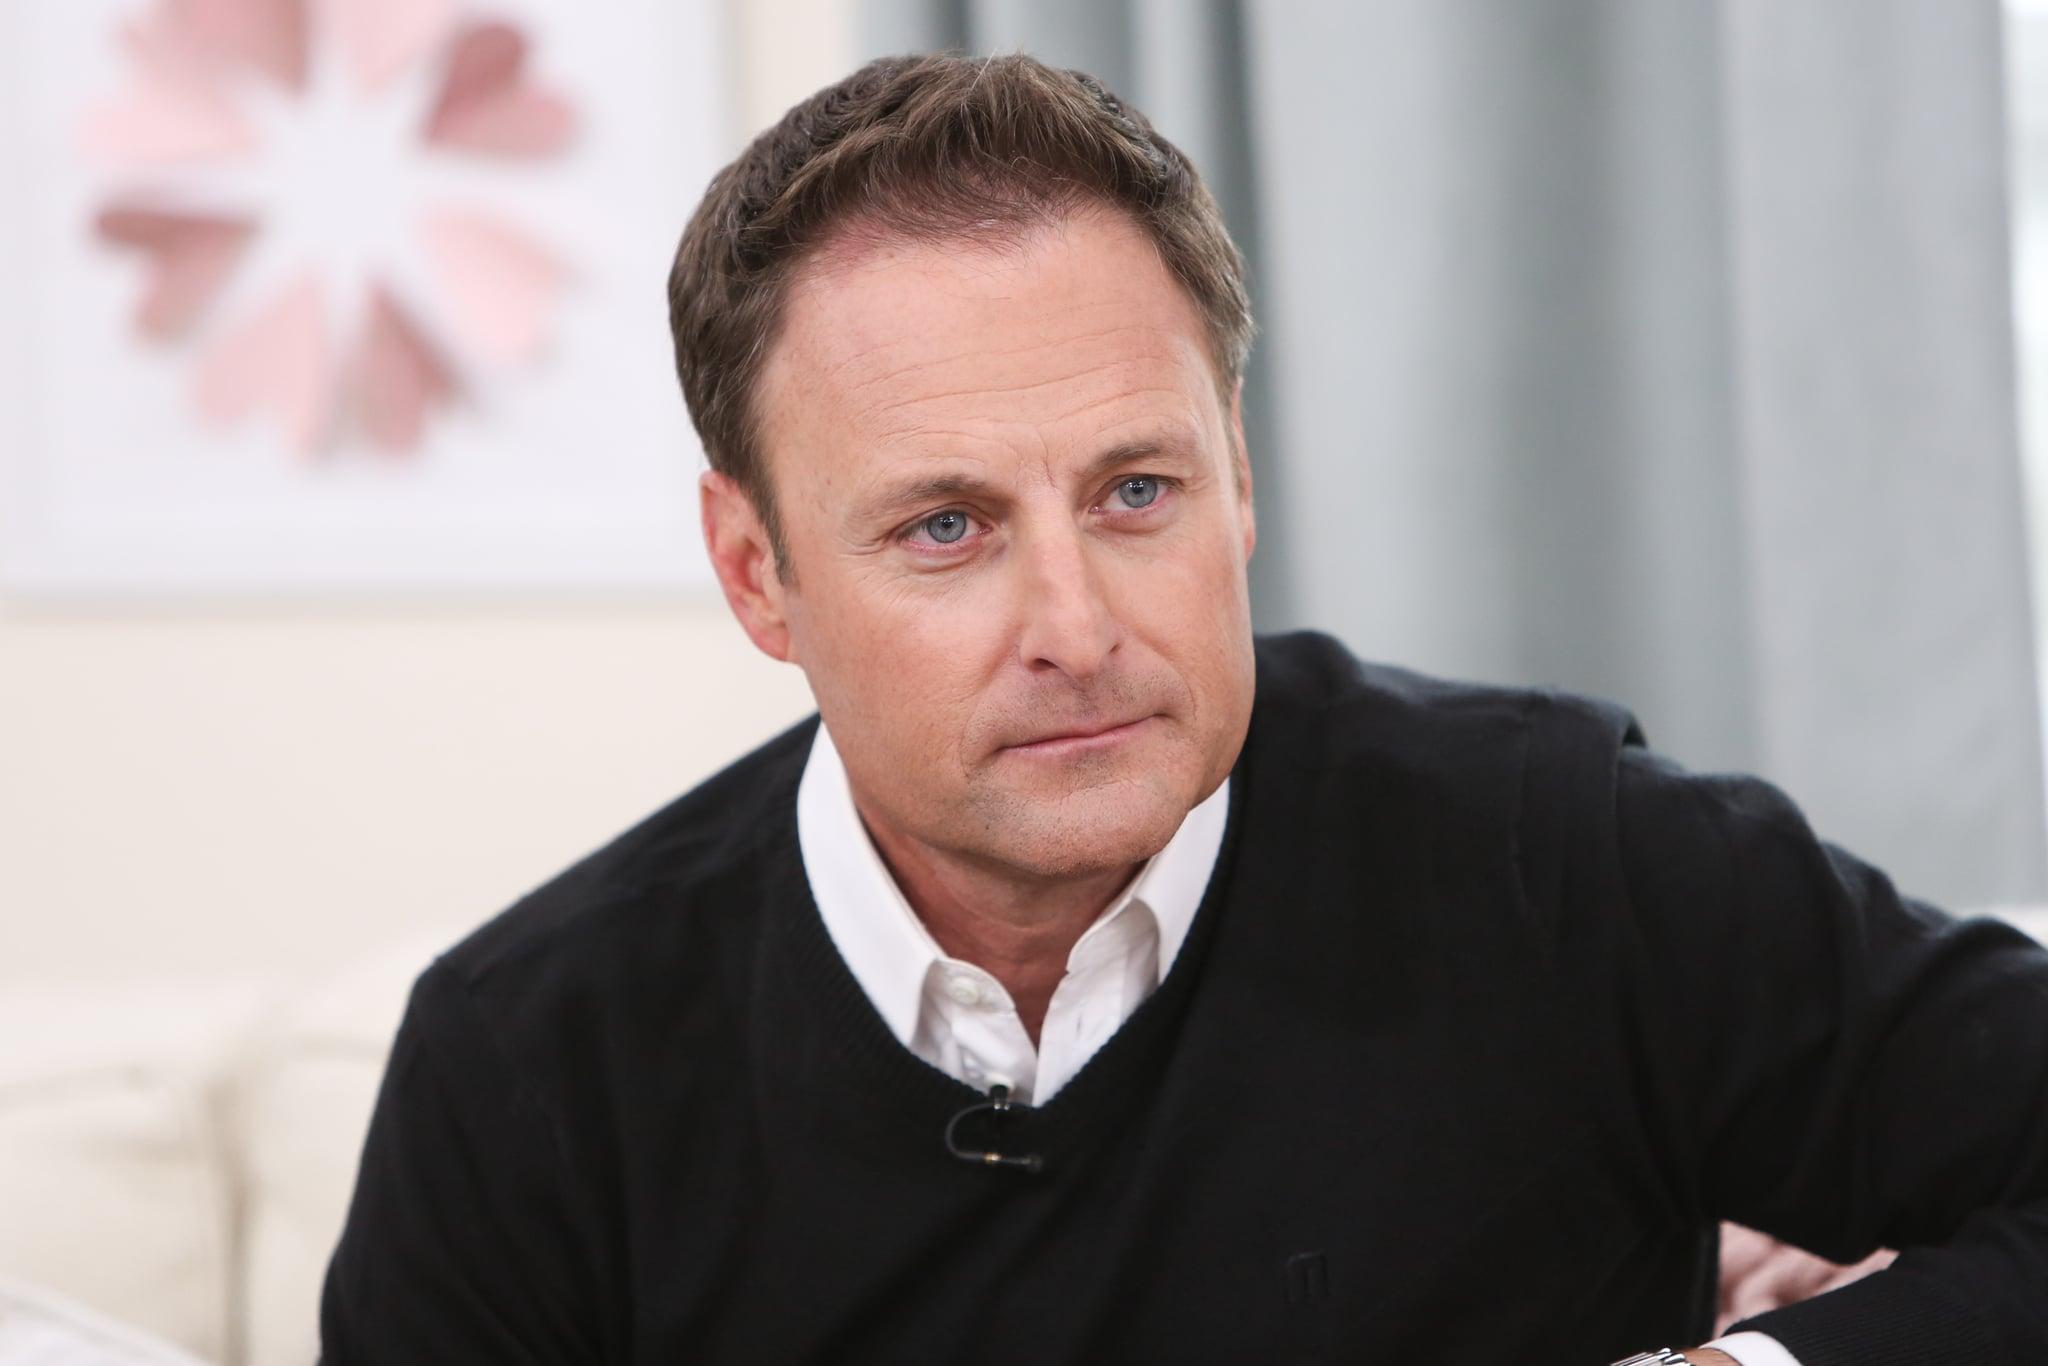 UNIVERSAL CITY, CALIFORNIA - FEBRUARY 13: TV Personality Chris Harrison visits Hallmark's